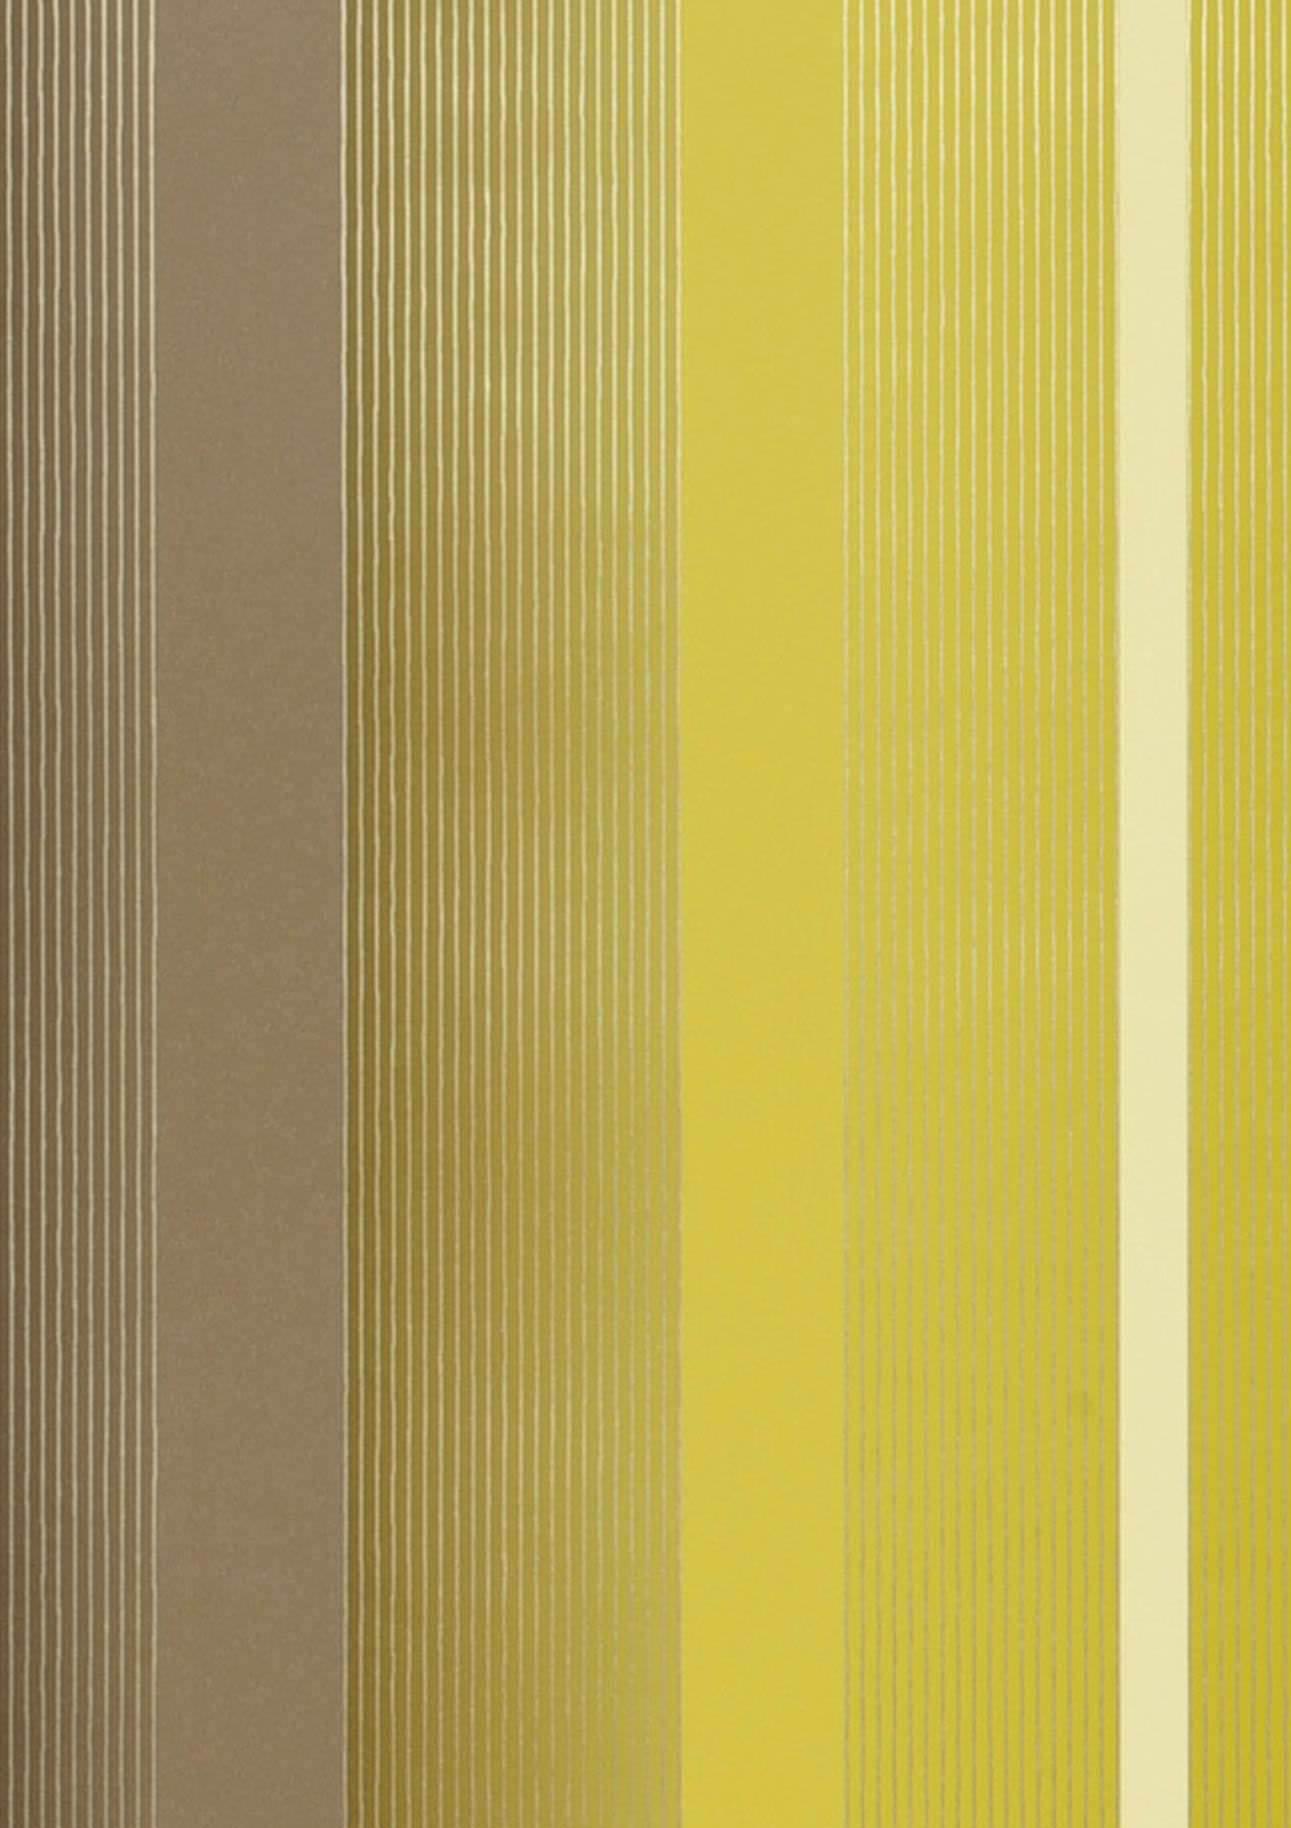 tapete orthos gelbgr n blassbraun weissgold glanz tapeten der 70er. Black Bedroom Furniture Sets. Home Design Ideas